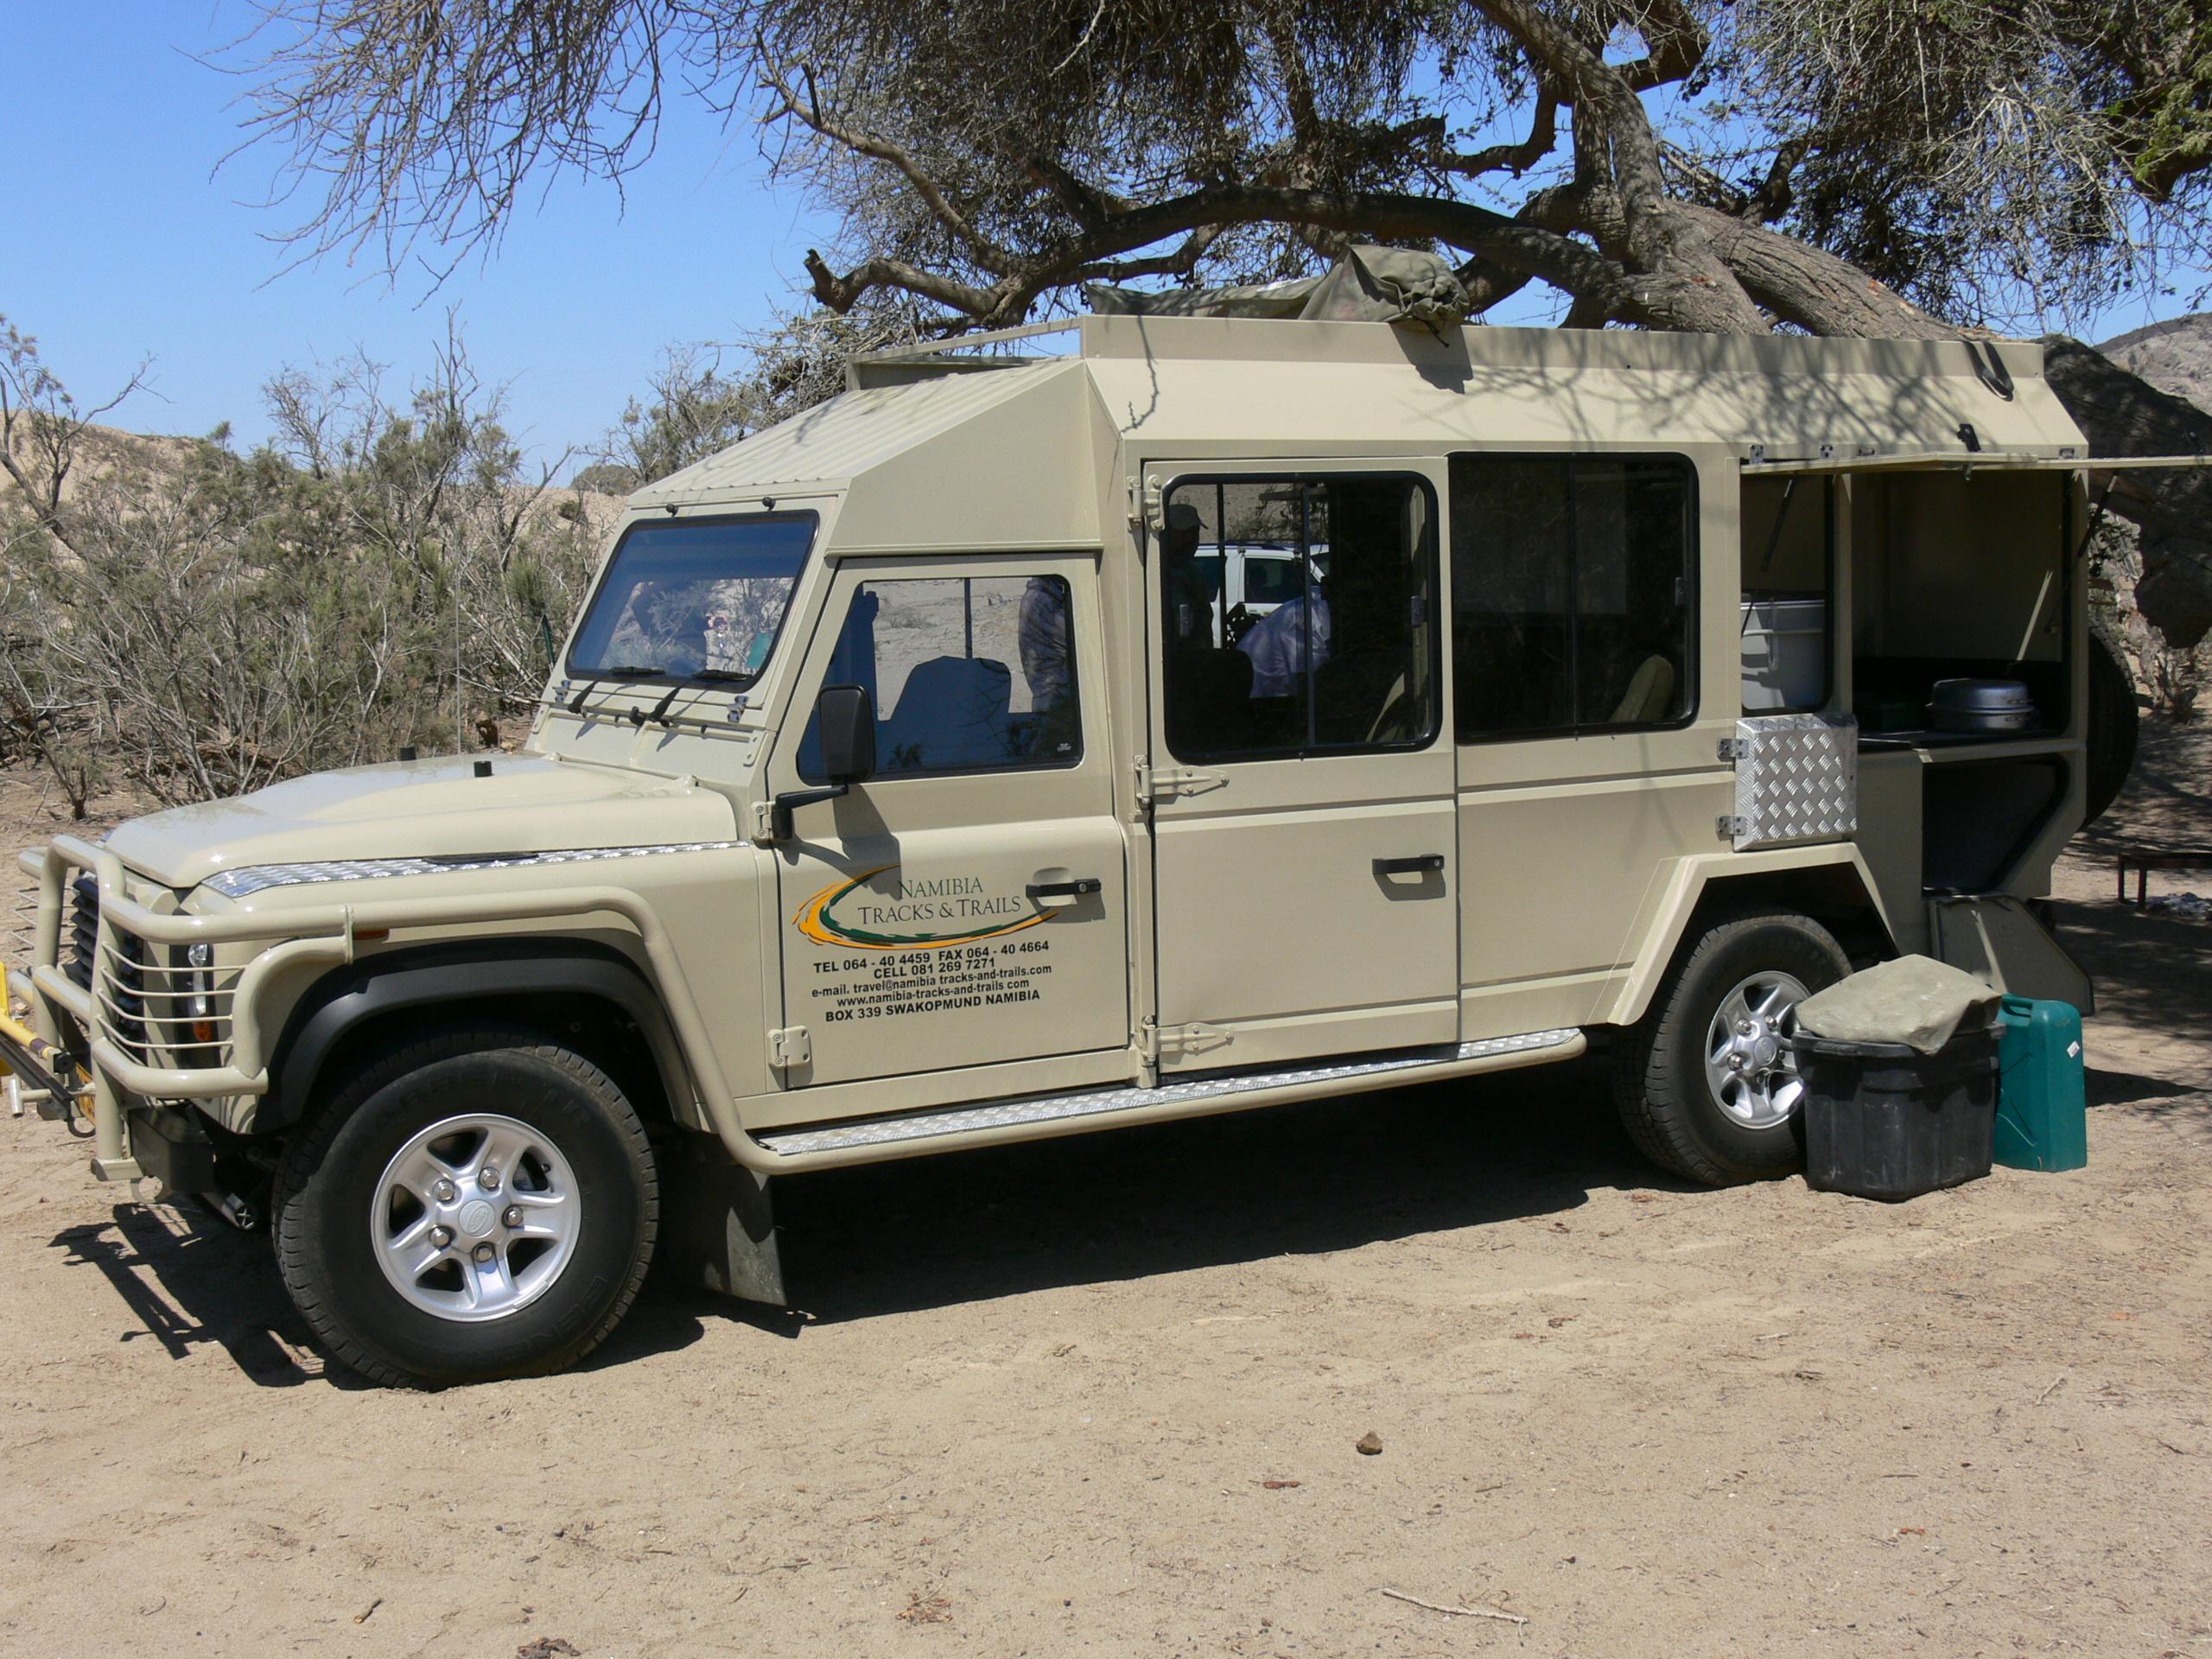 Namibia Tracks & Trails